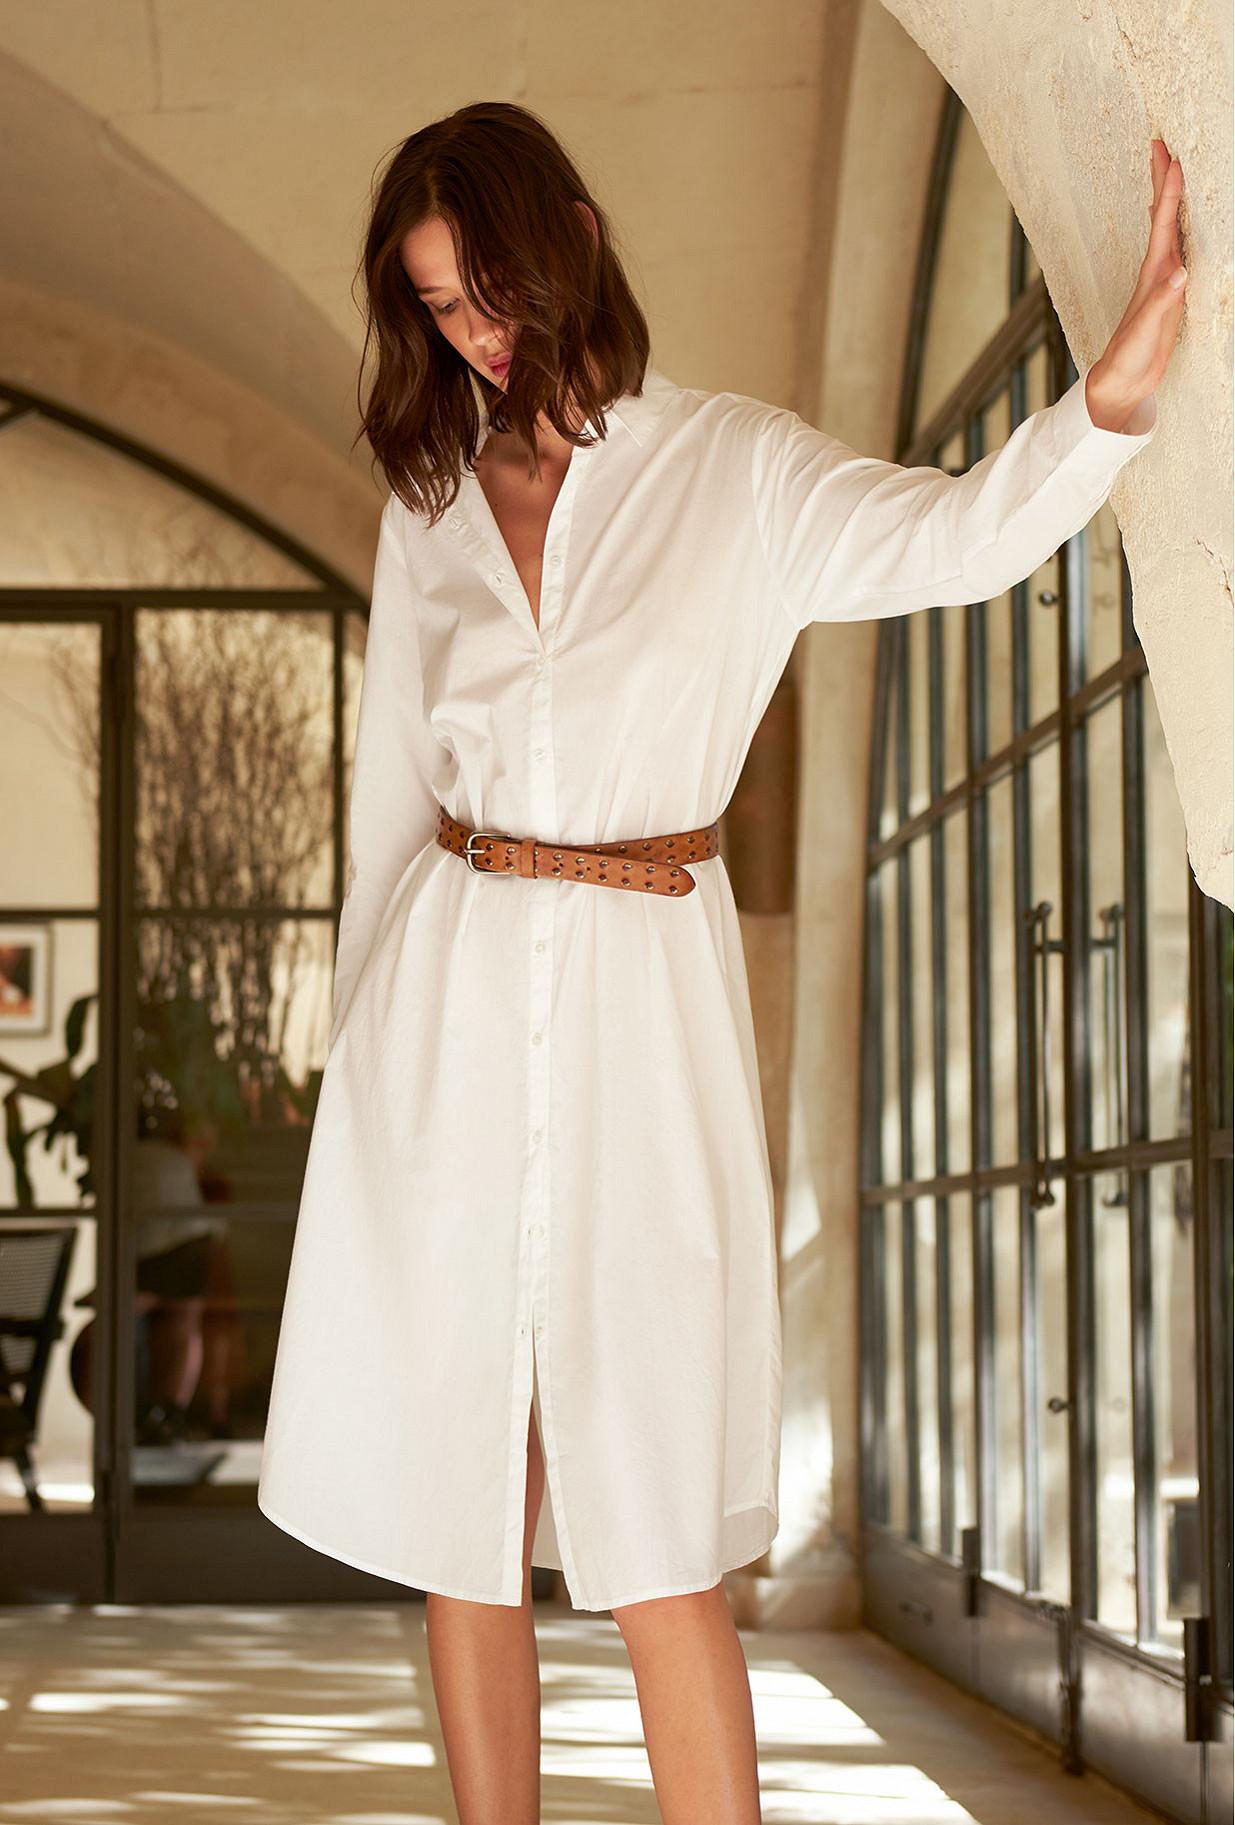 Paris clothes store Shirt  Clotha french designer fashion Paris